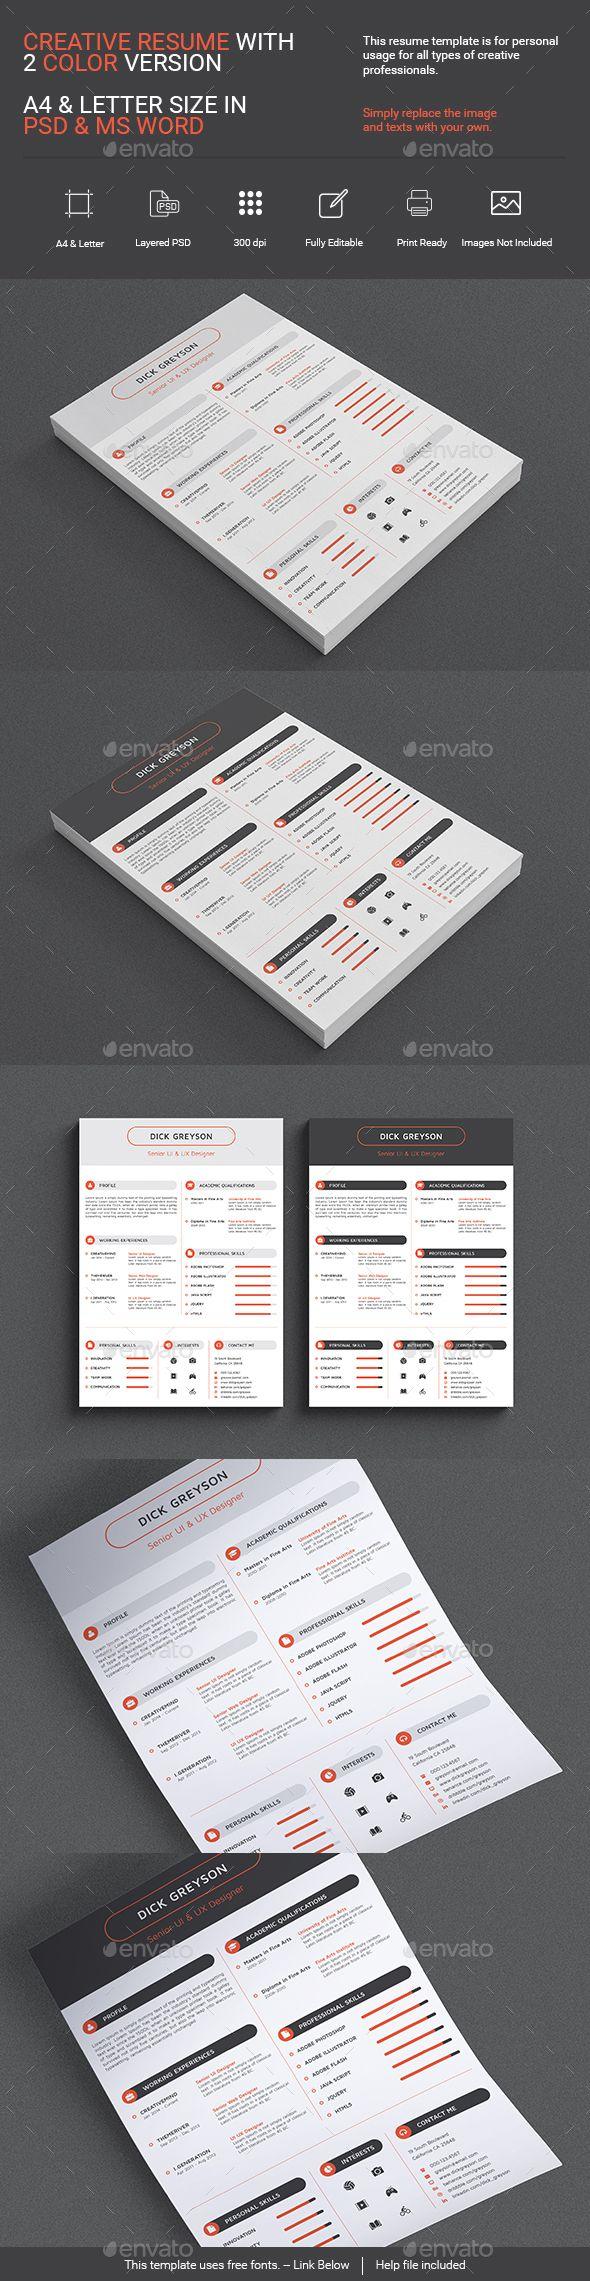 Creative Resume PSD u0026 MS Word Template